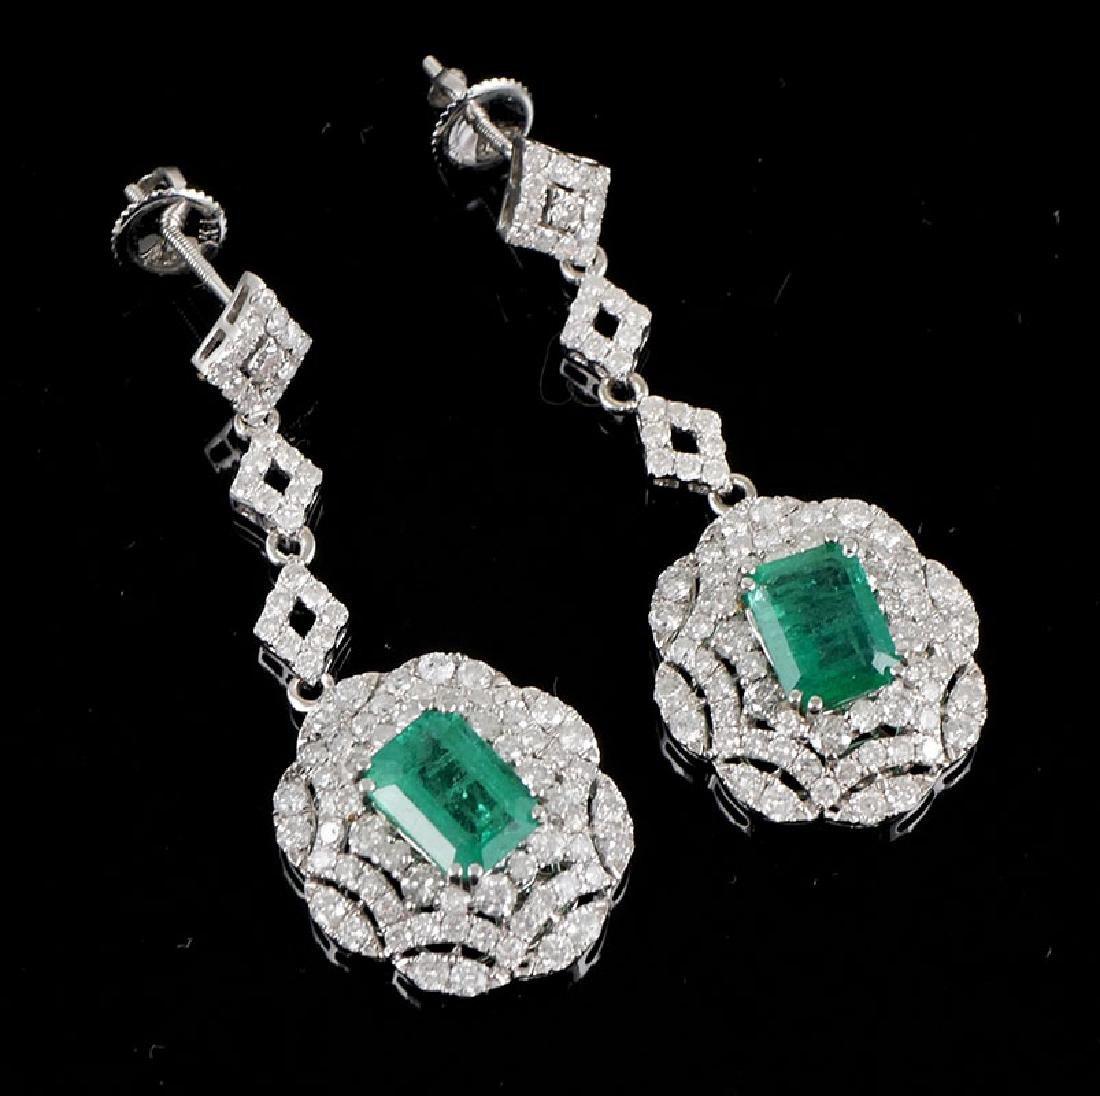 14k WG Emerald & Diamond Dangle Earrings 2.76ct